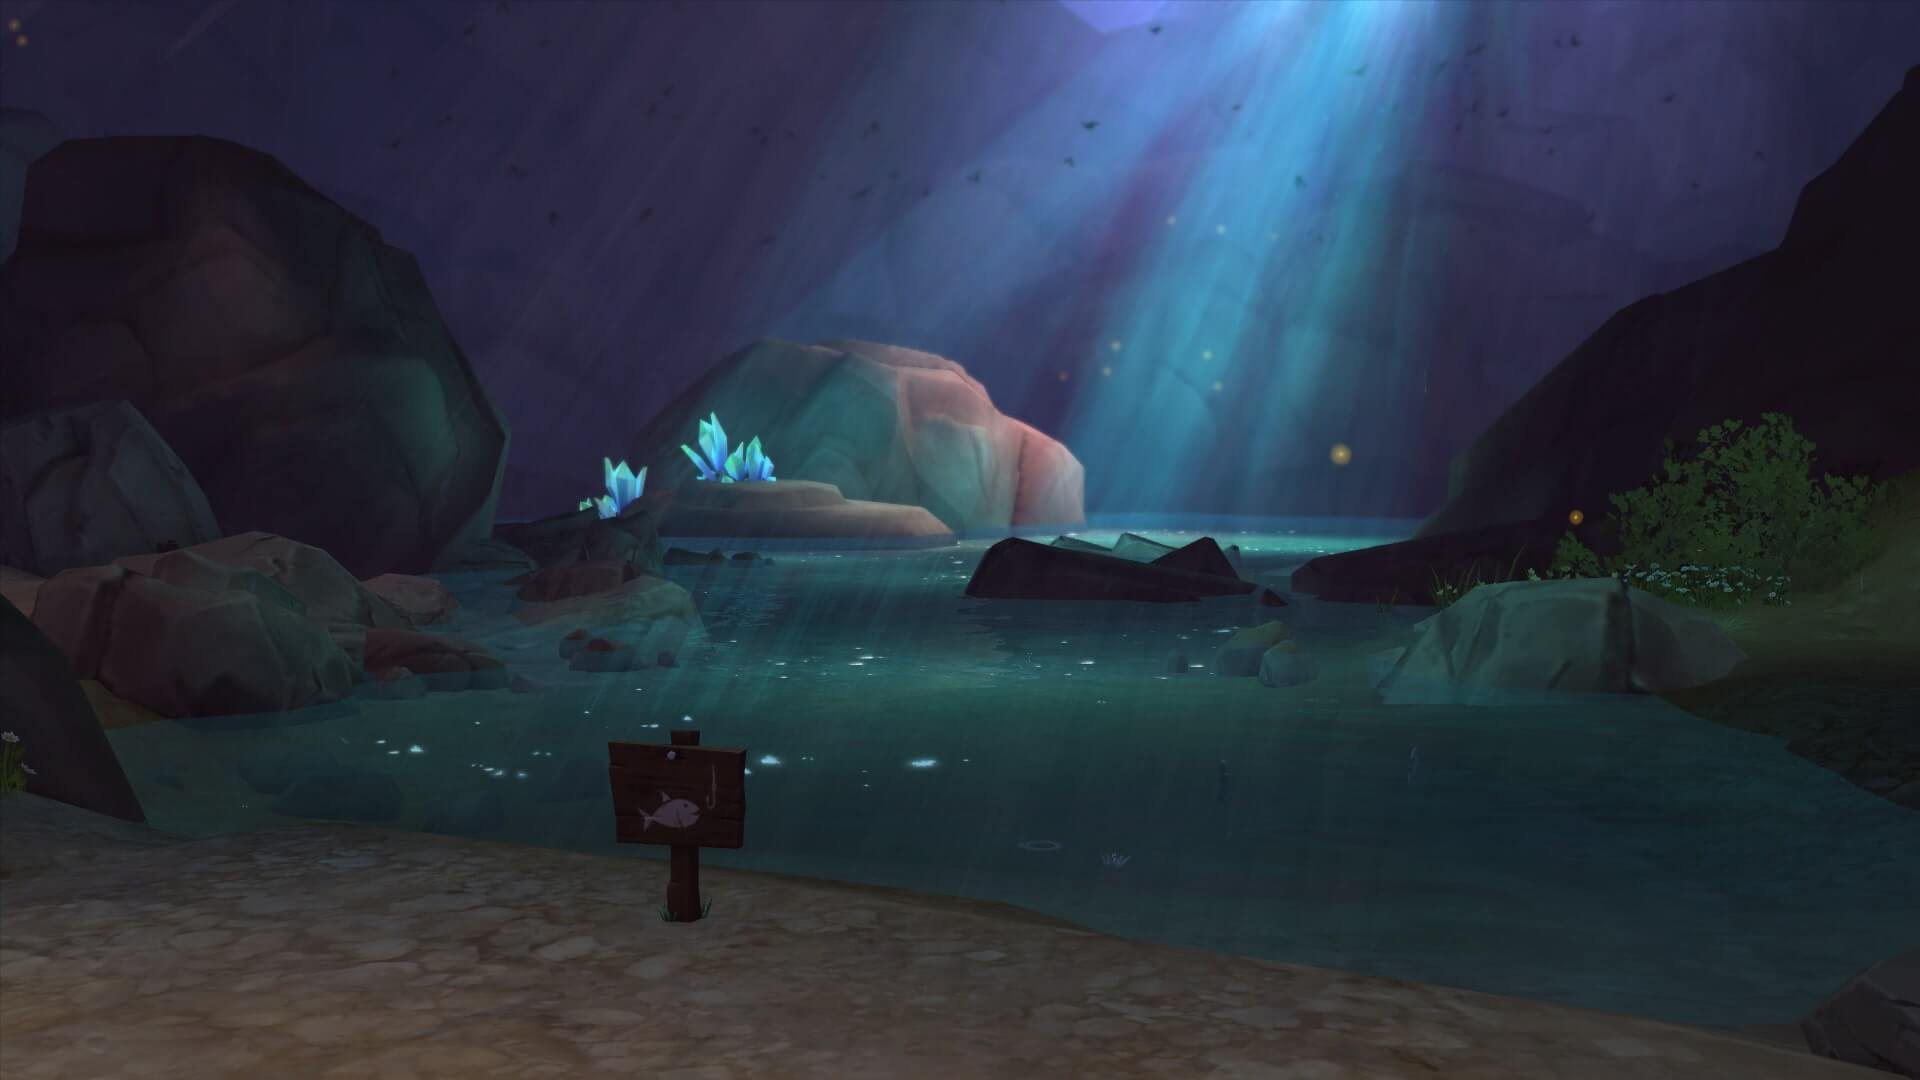 Sims 4 Crystals